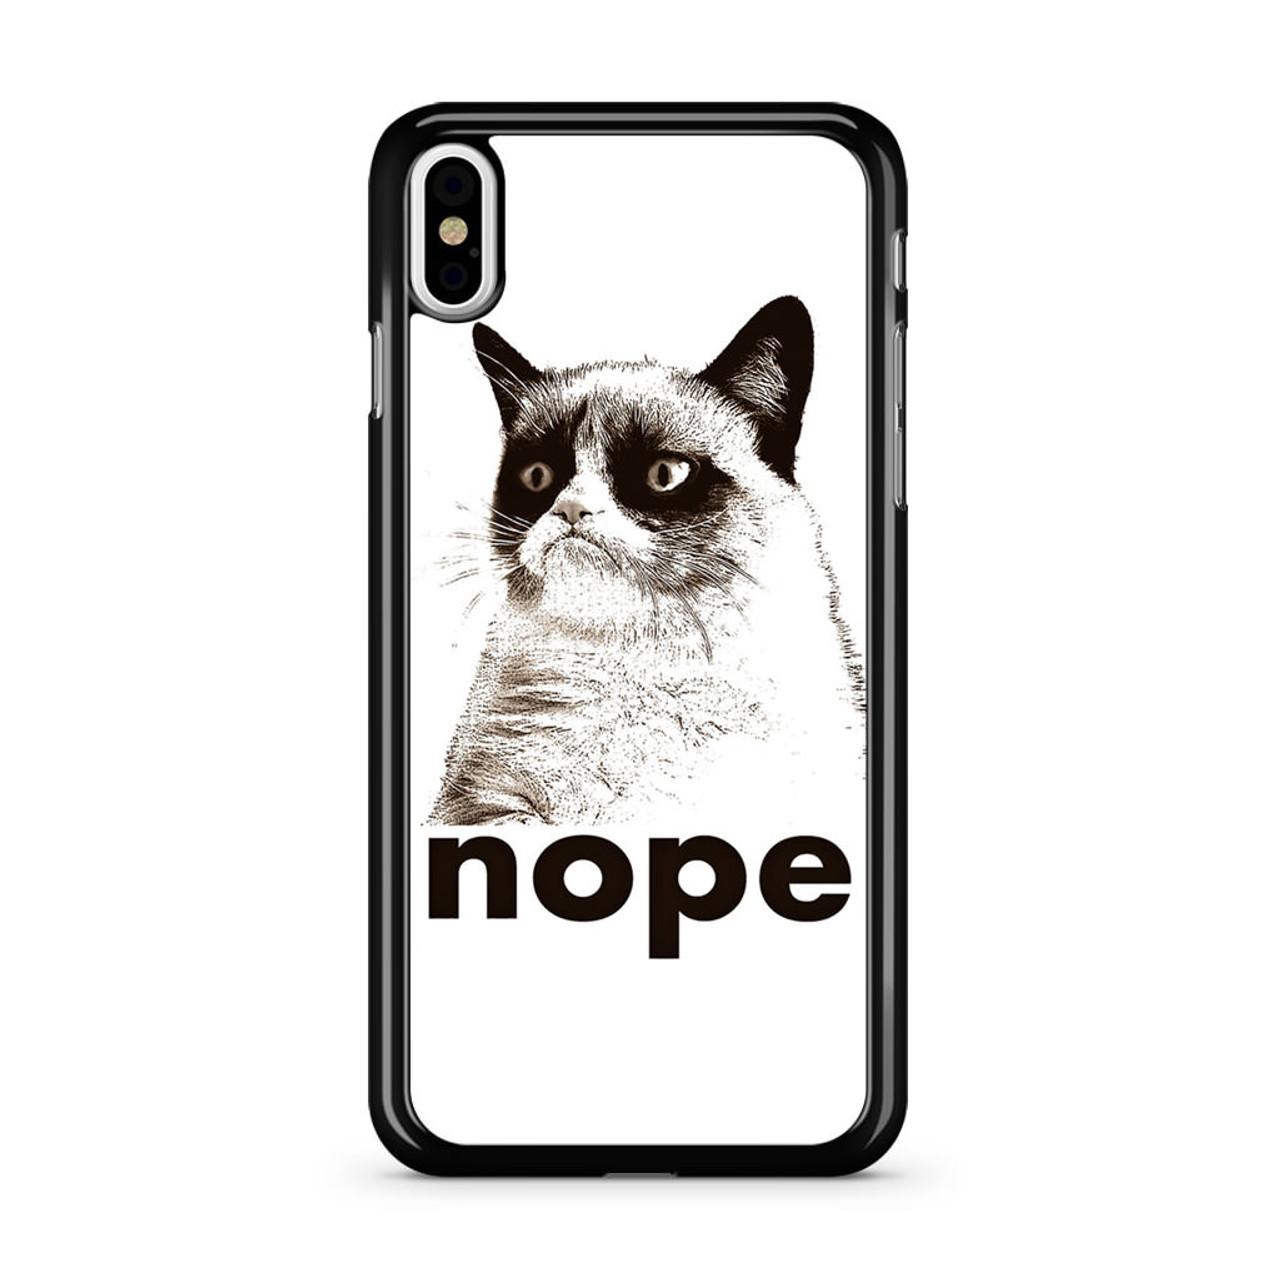 low priced 1ece1 6d7ab Nope grumpy Cat iPhone X Case